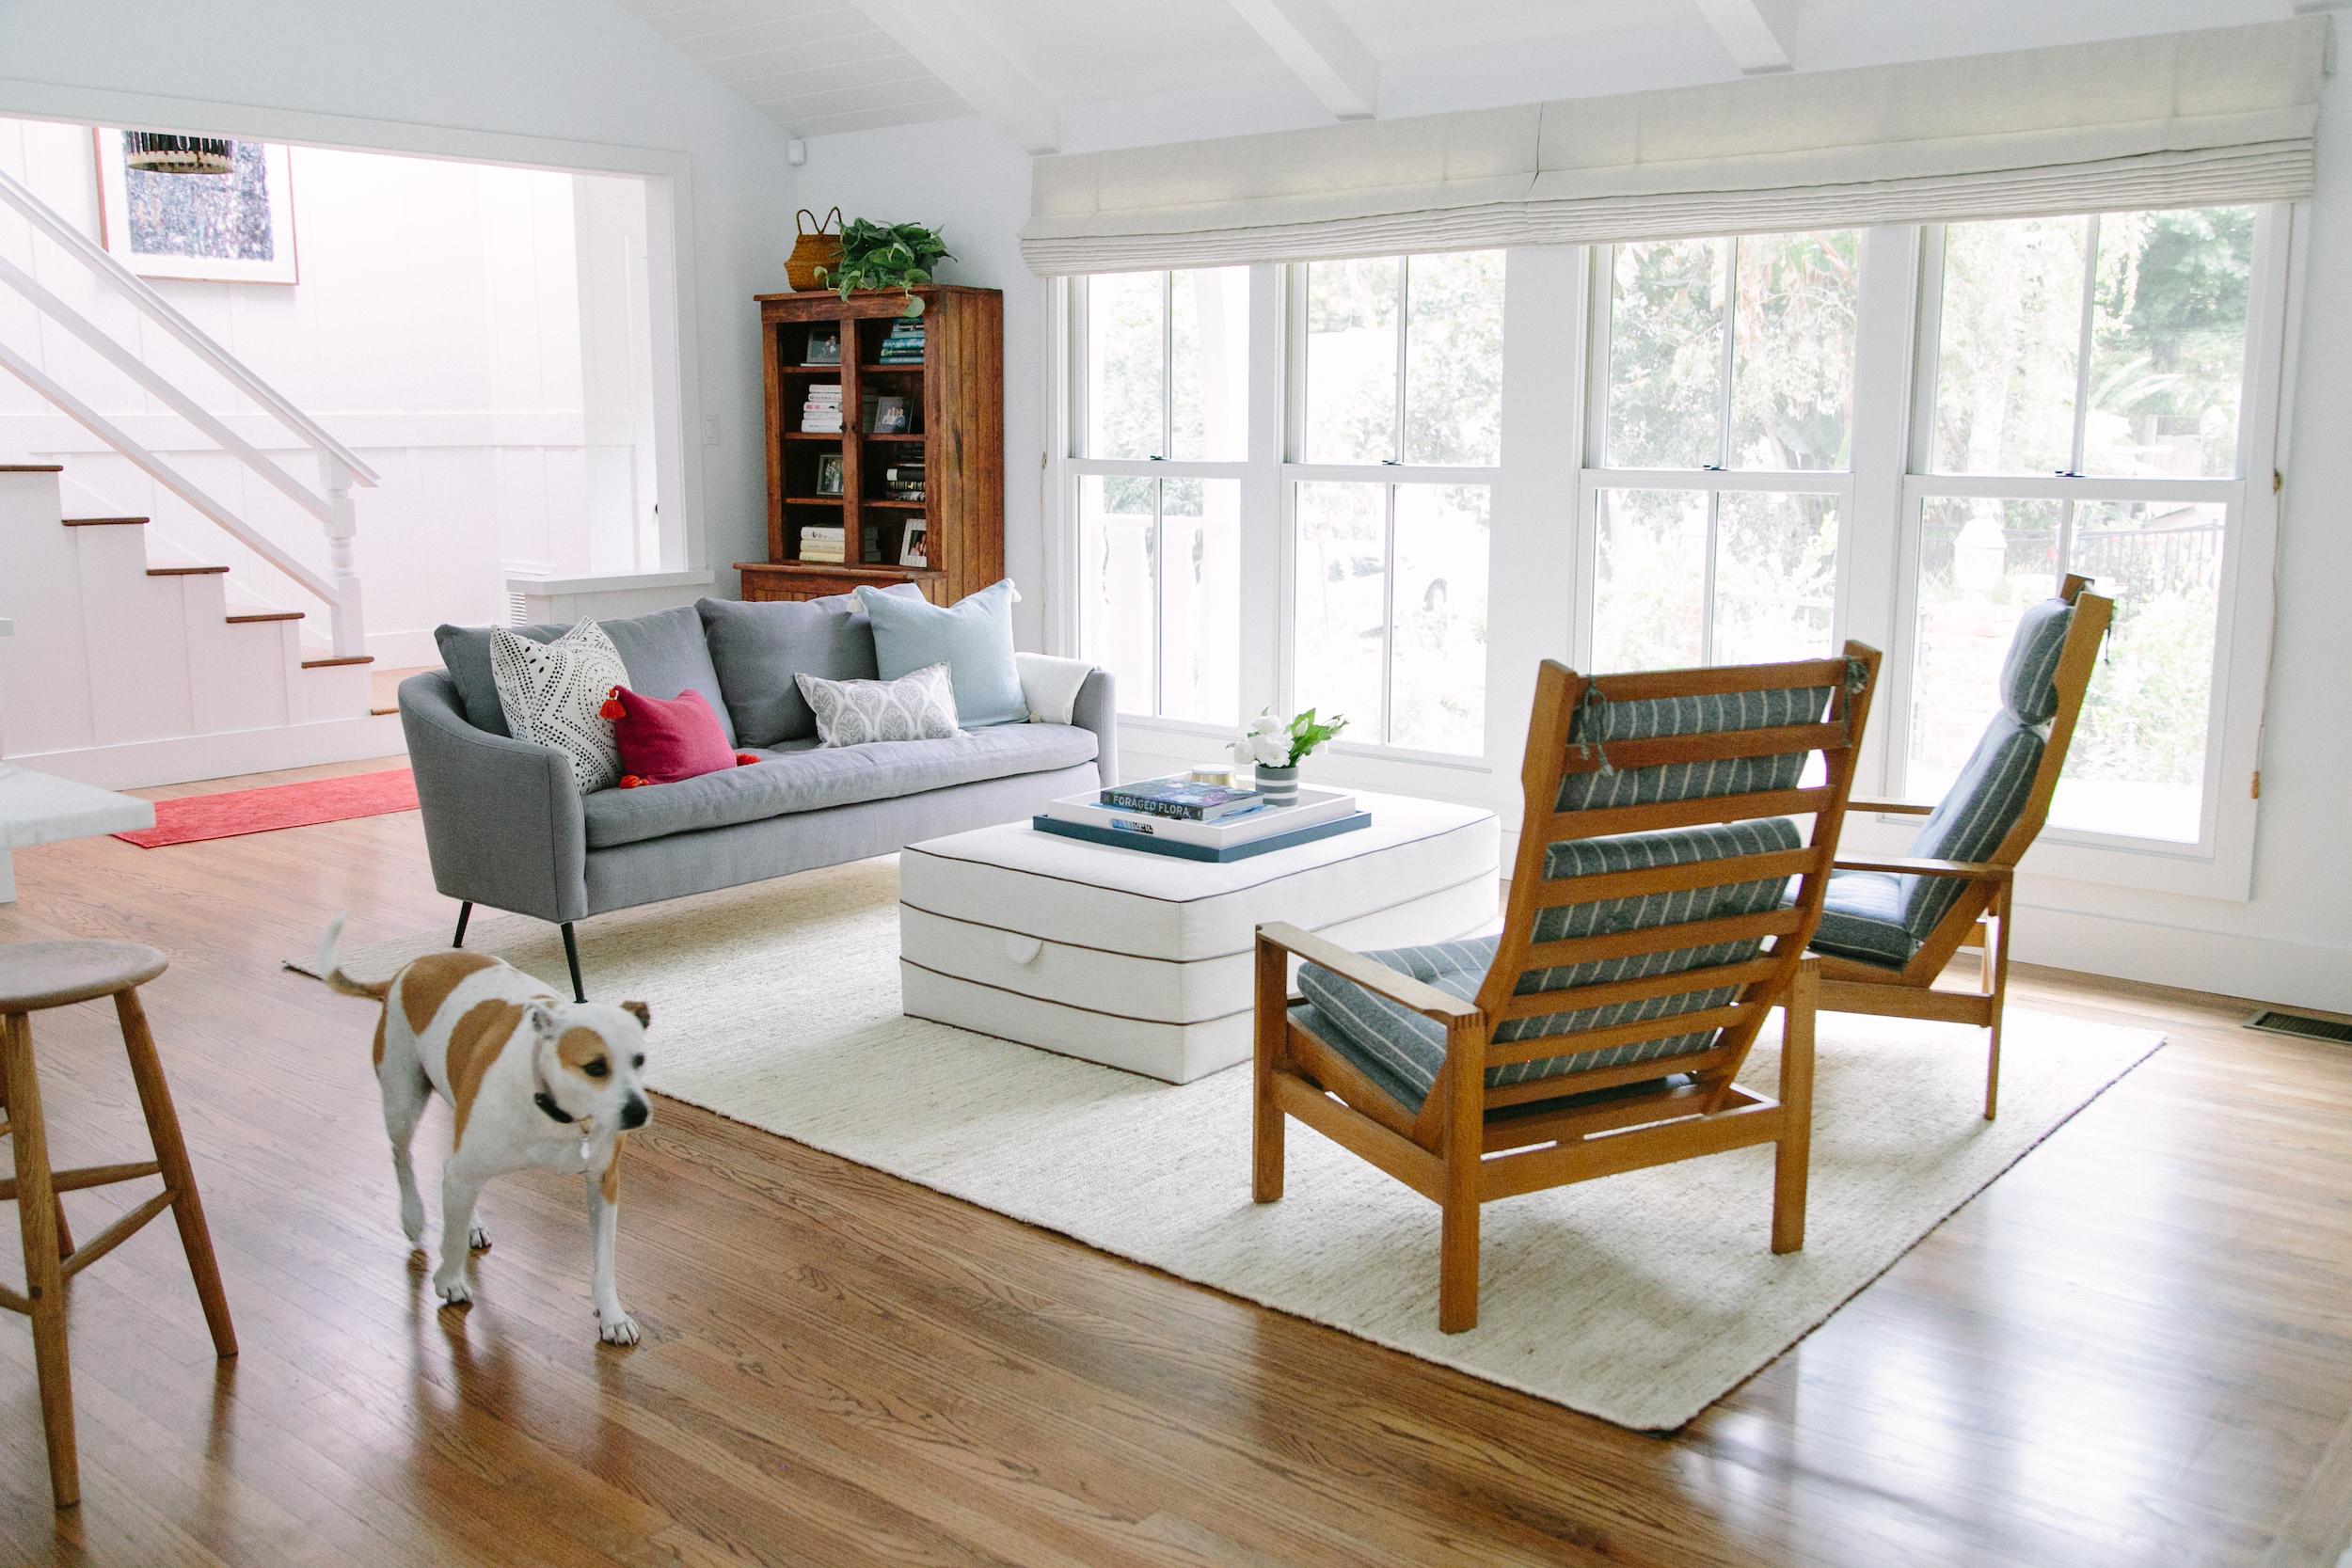 Everhem linen Roman shades drawn open to let light inside a modern living room